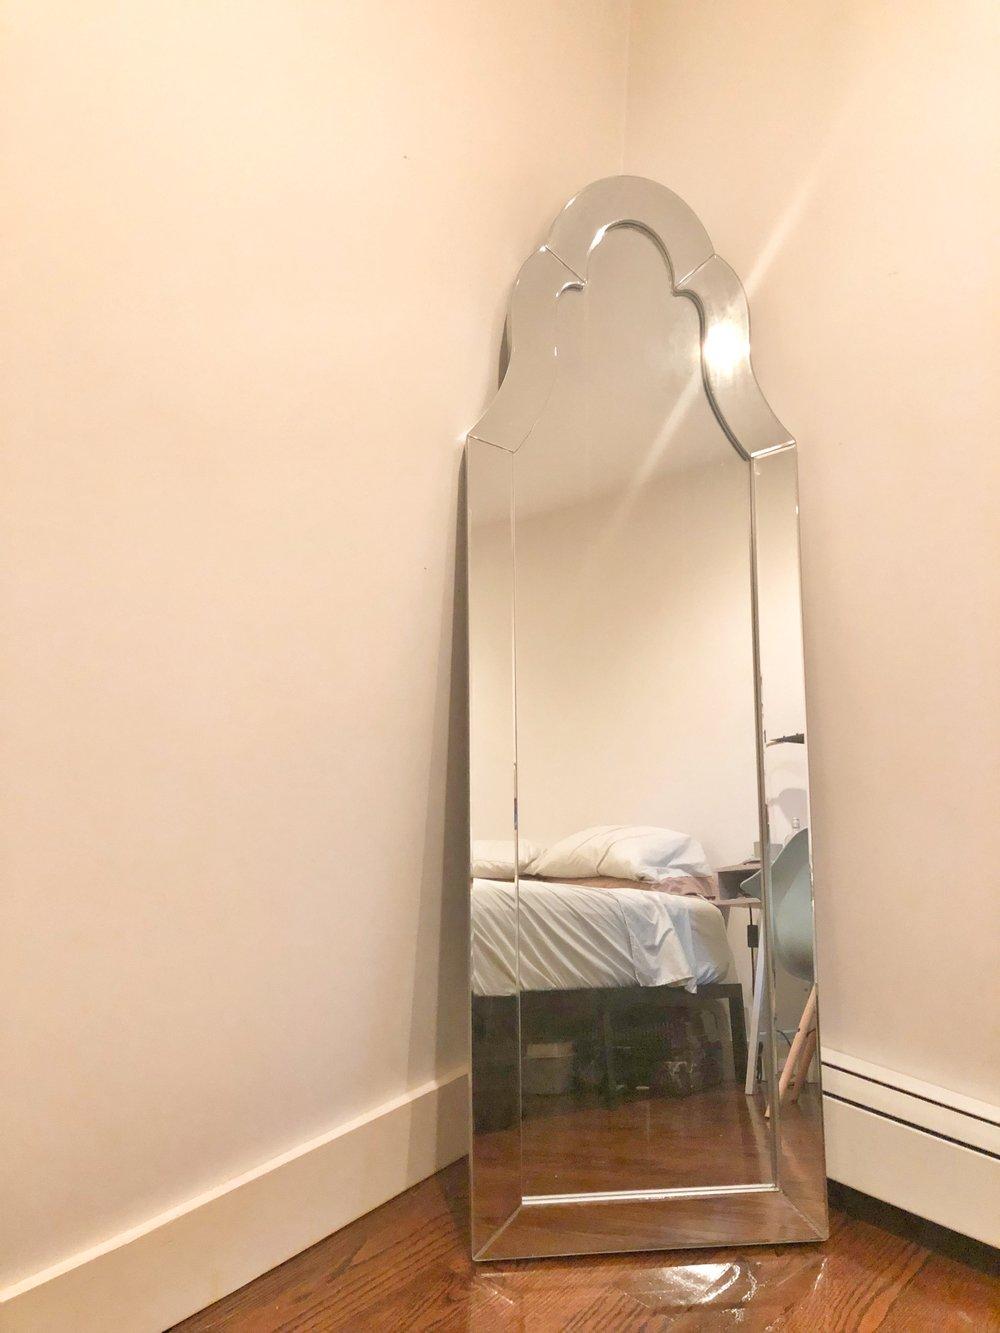 Dini Leaning Mirror in Matte Silver from Aiden Lane - Eri Sabalvoro